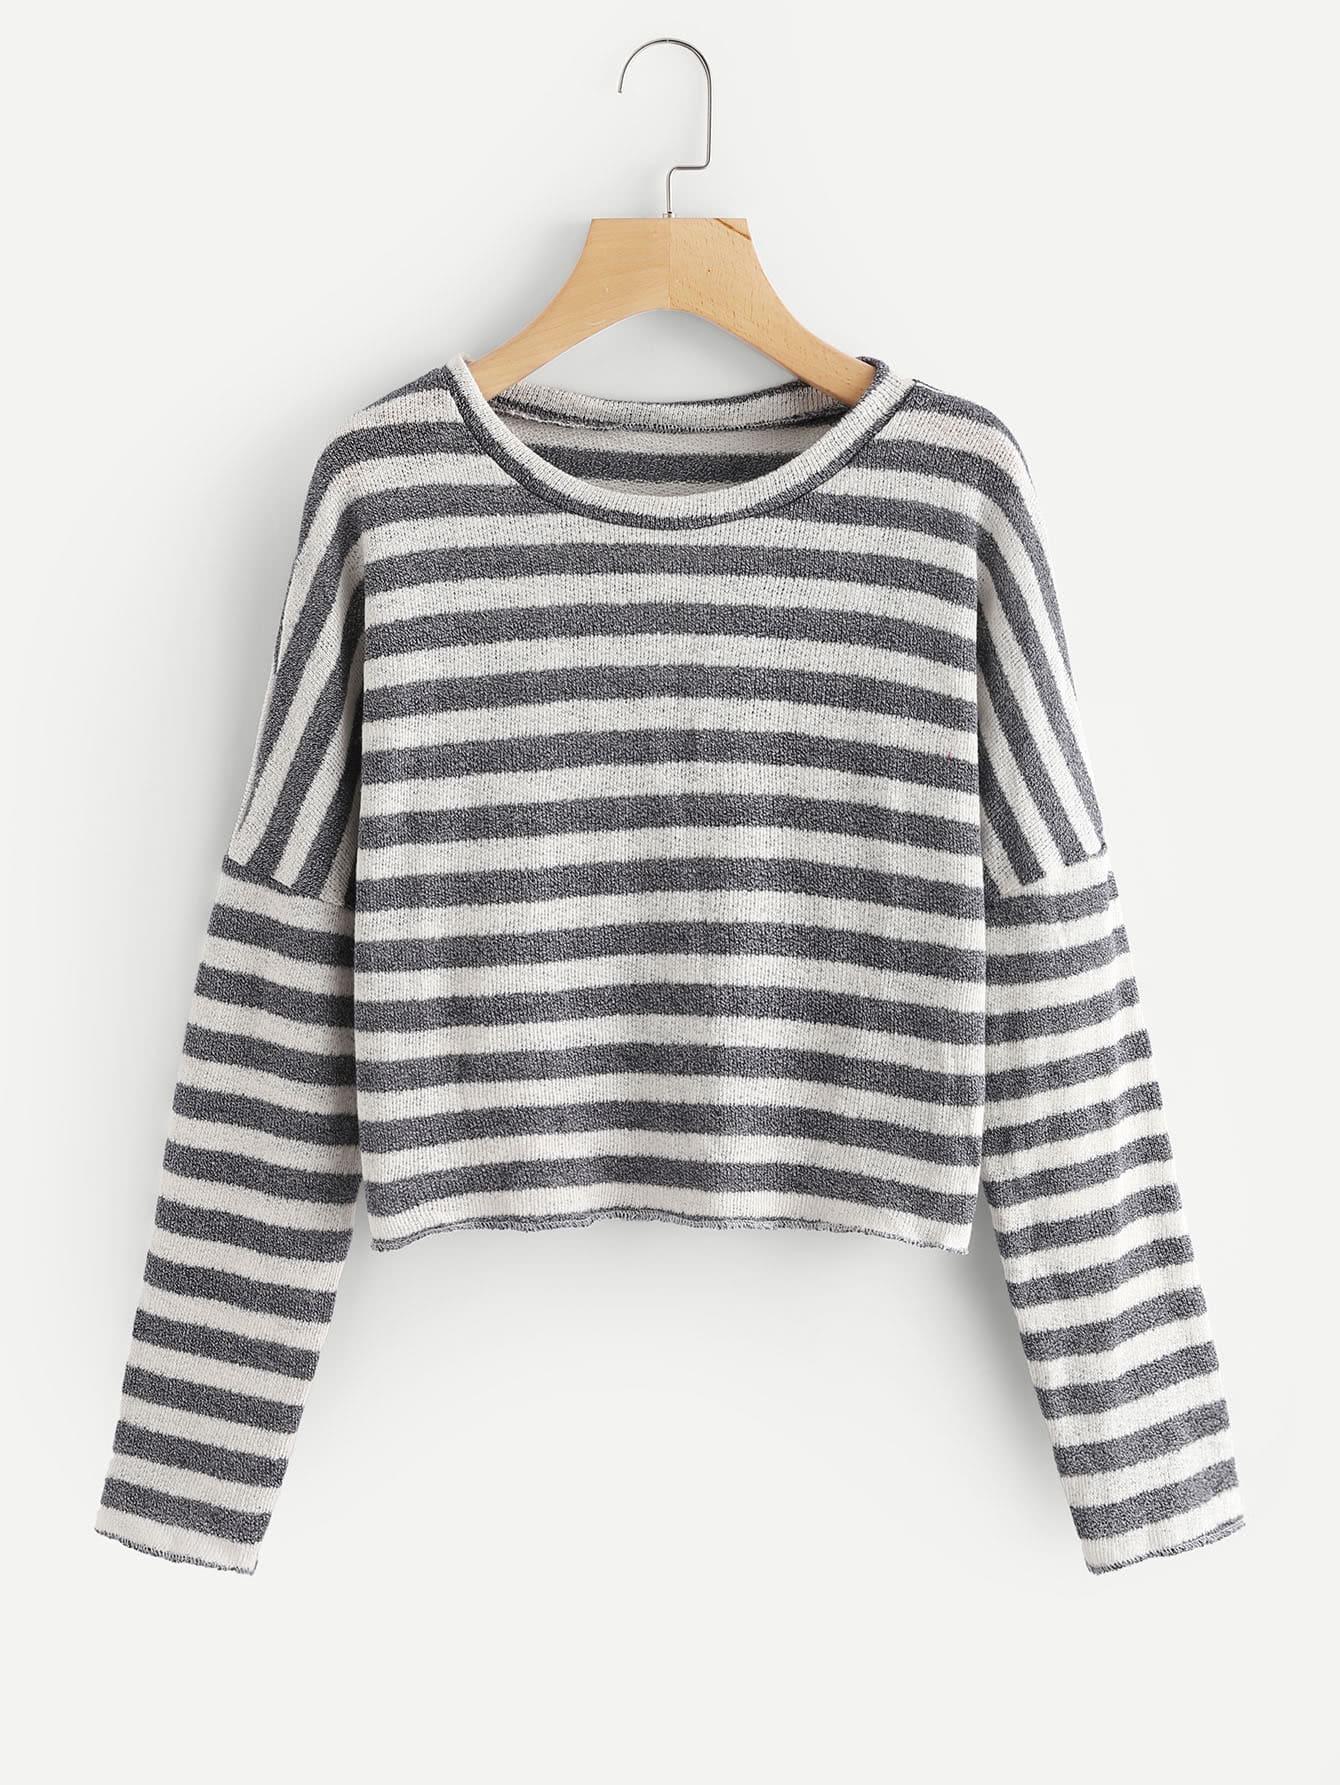 Drop Shoulder Striped Knit Sweater drop shoulder marled knit sweater